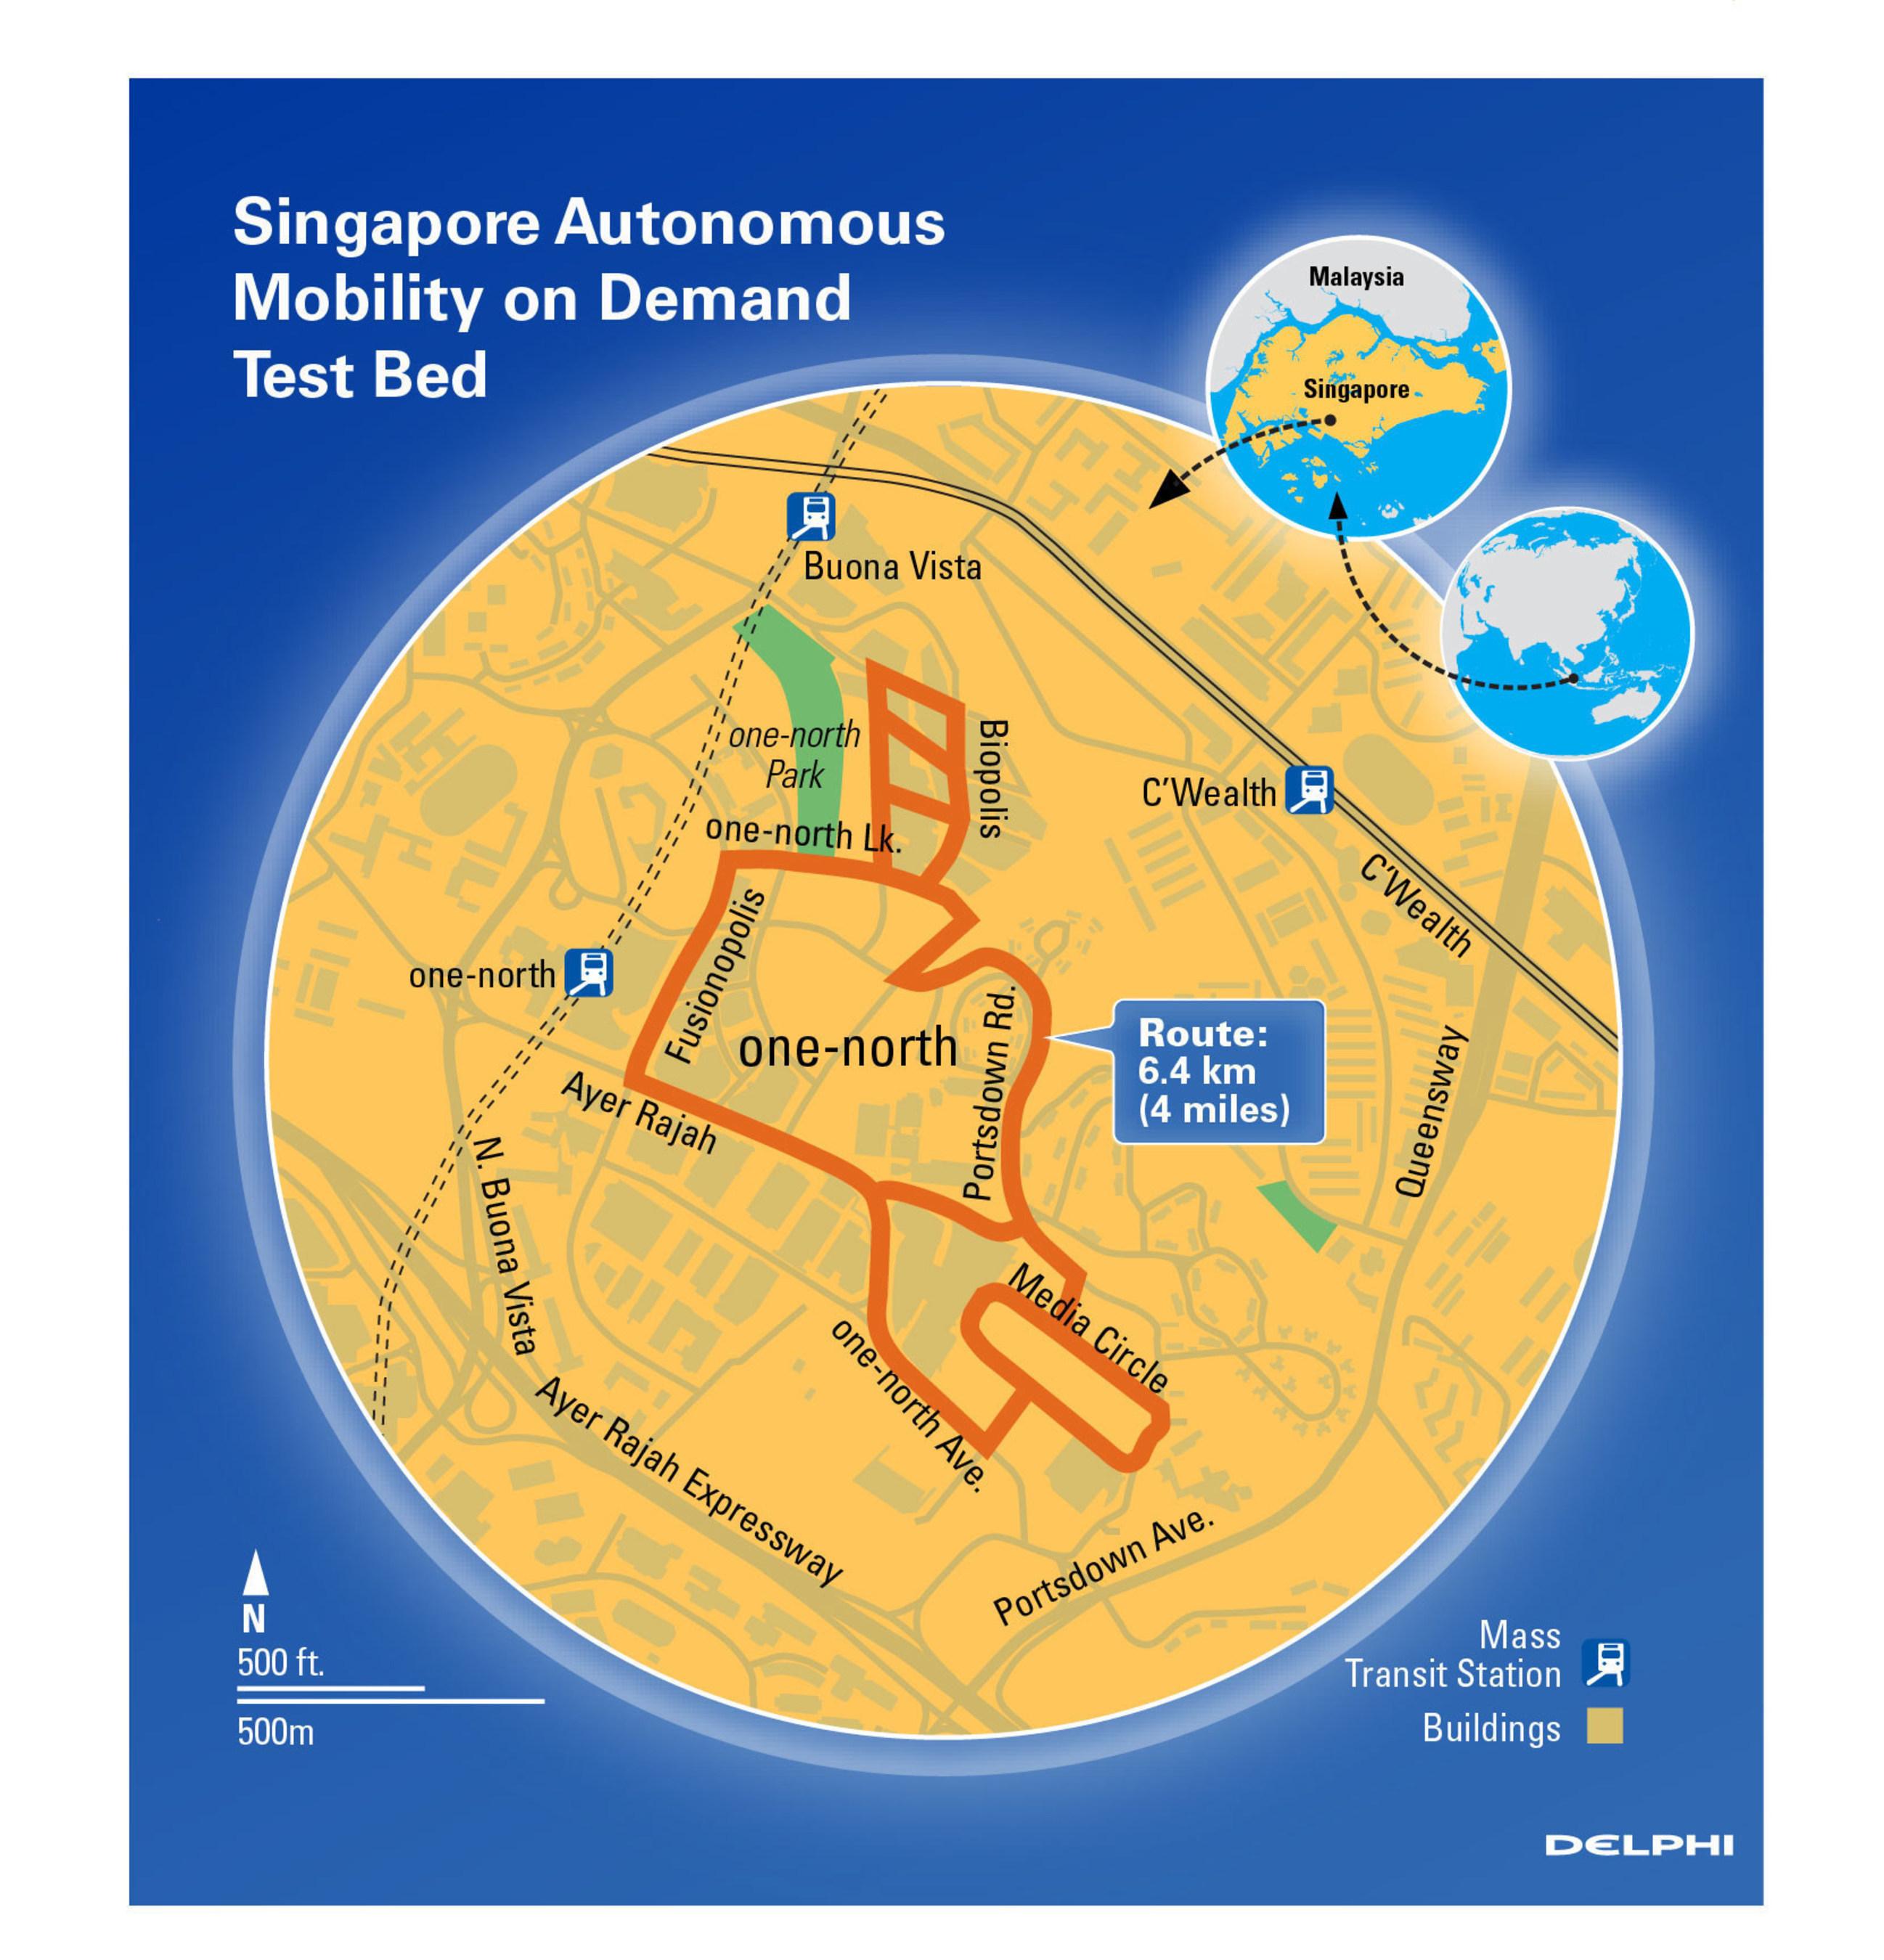 Wiring Car Delco Diagram Stereo 16148996 Electrical Diagrams Cd 16231055 Wires Delphi Pods Services U2022 Gm Radio